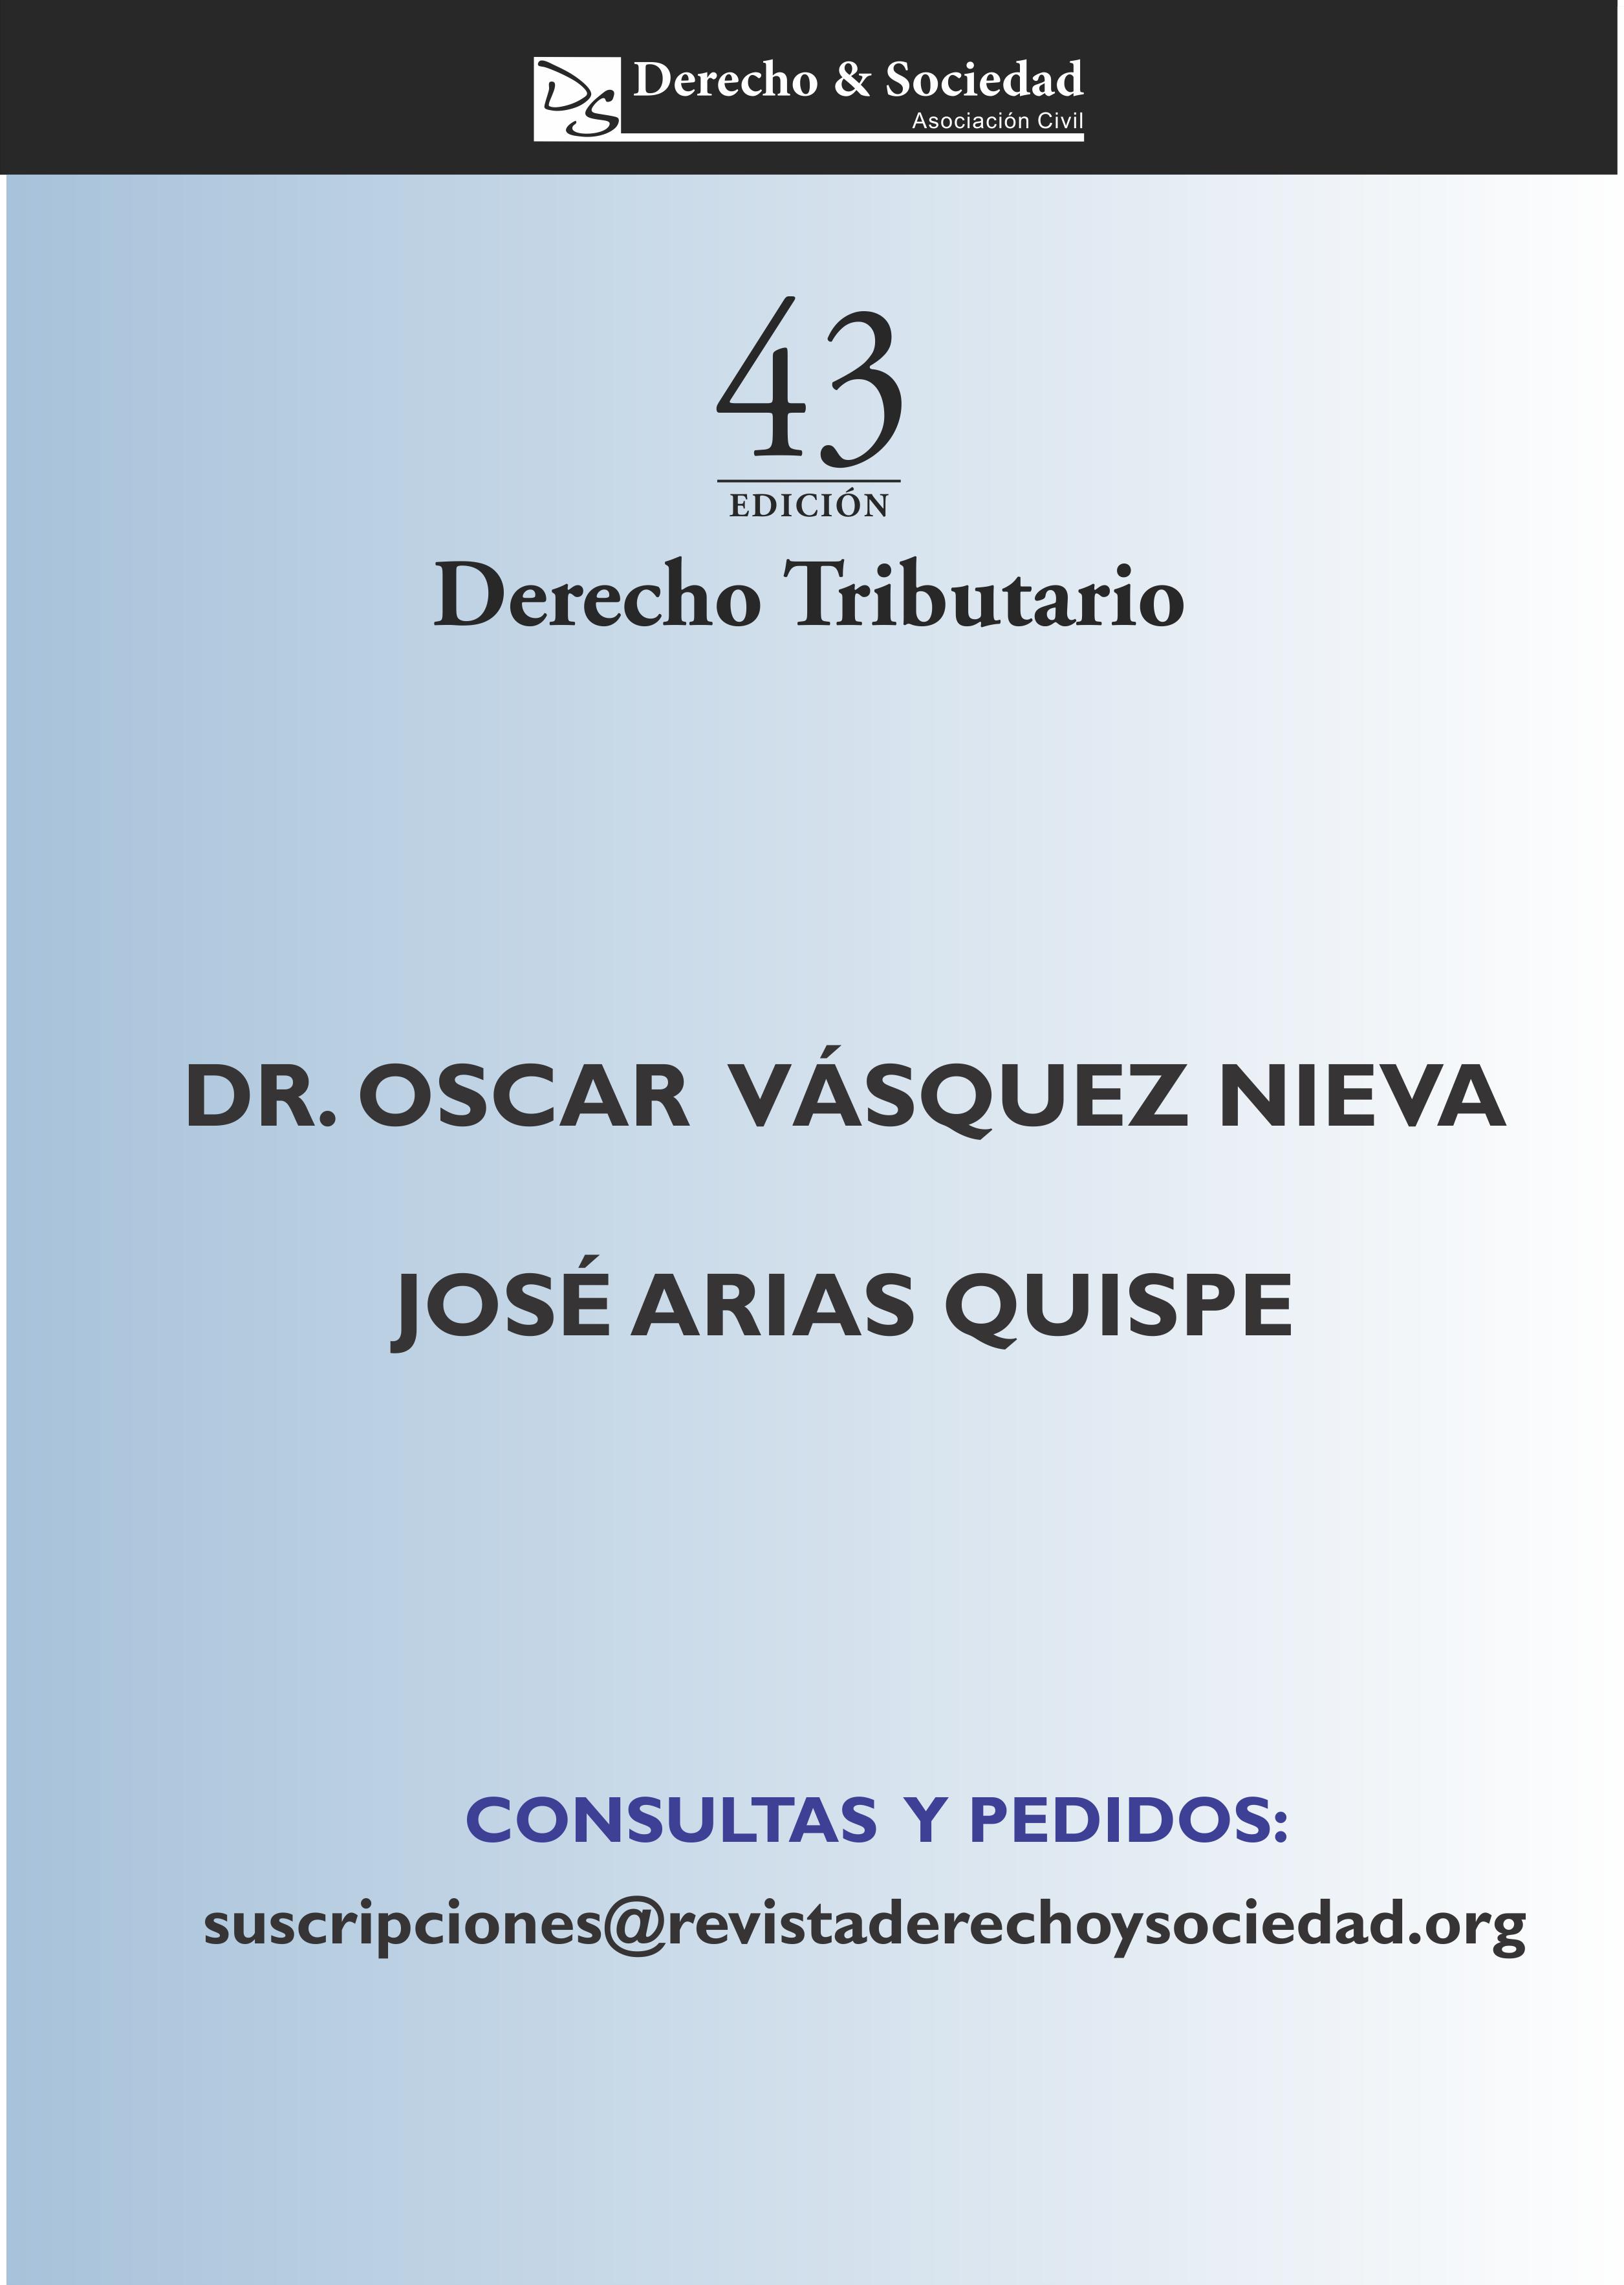 20150324-oscar_vasquez.png